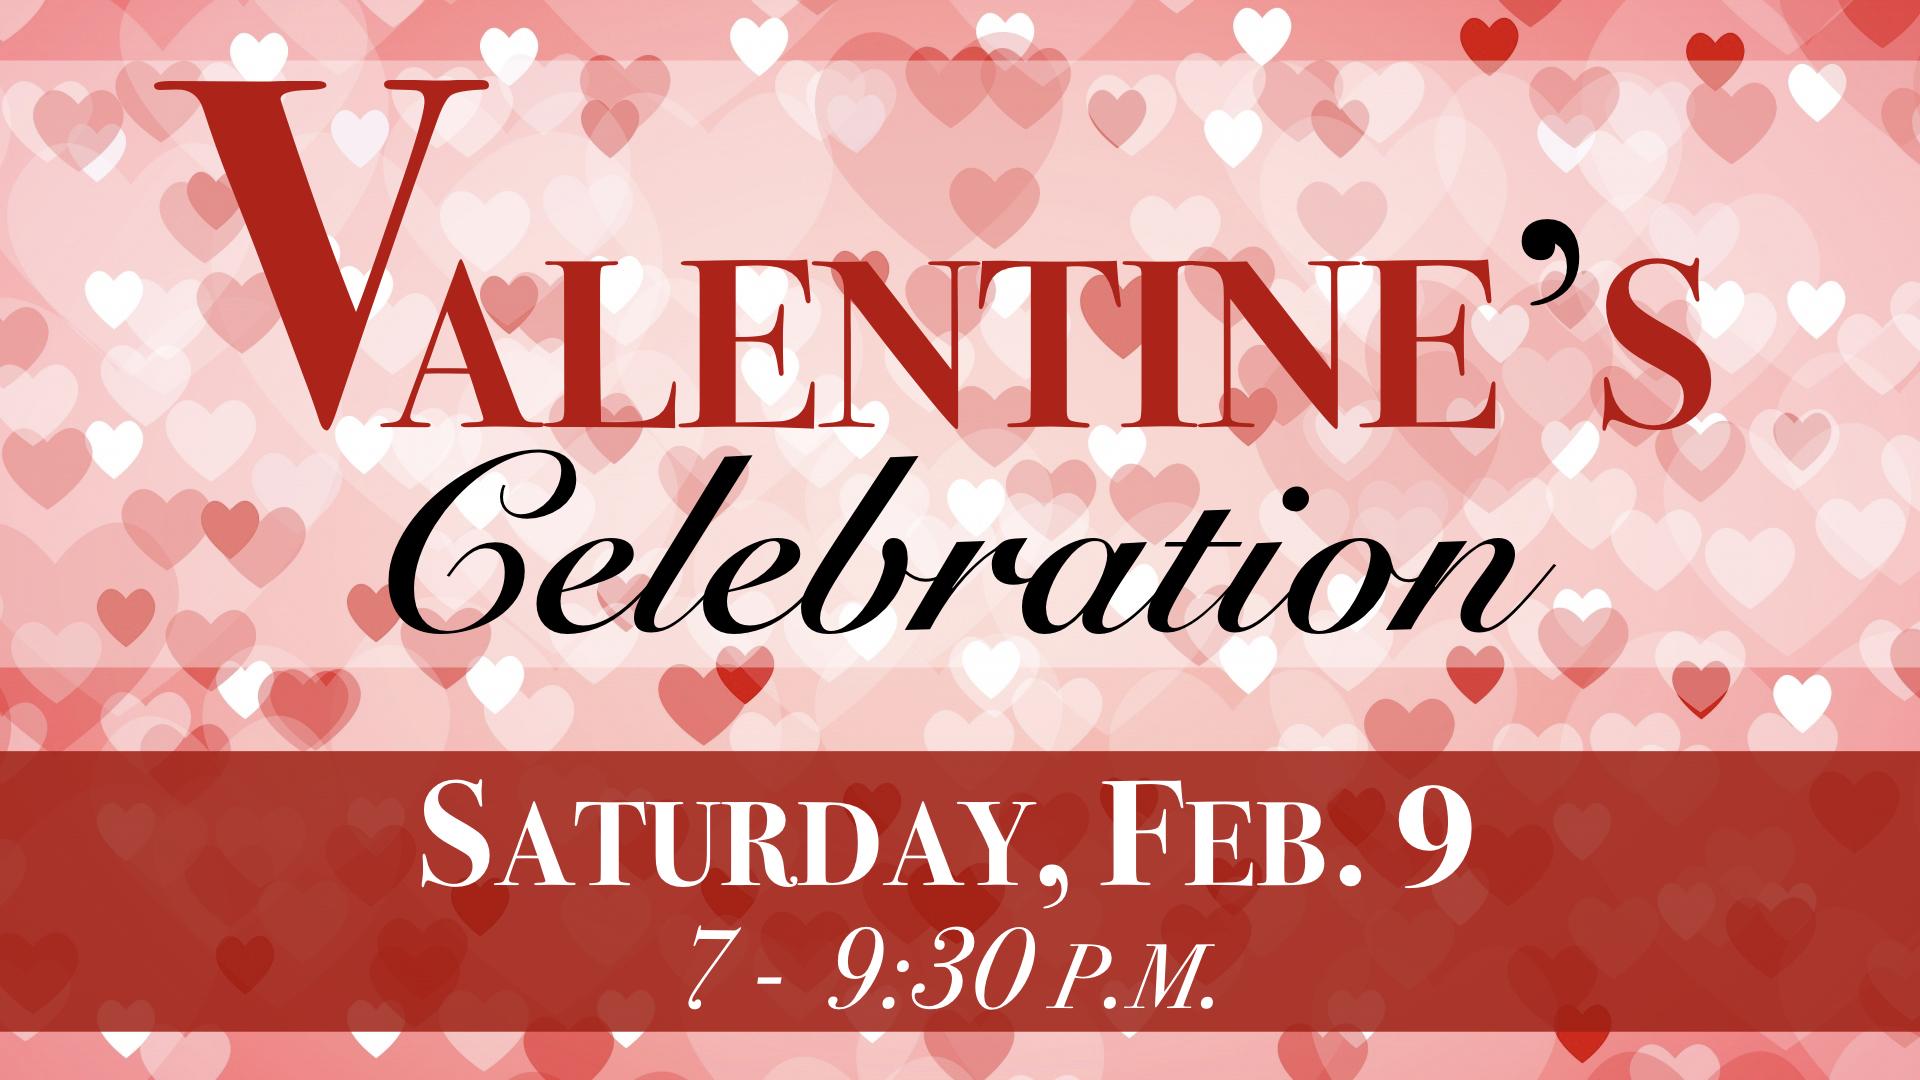 Valentine's Celebration